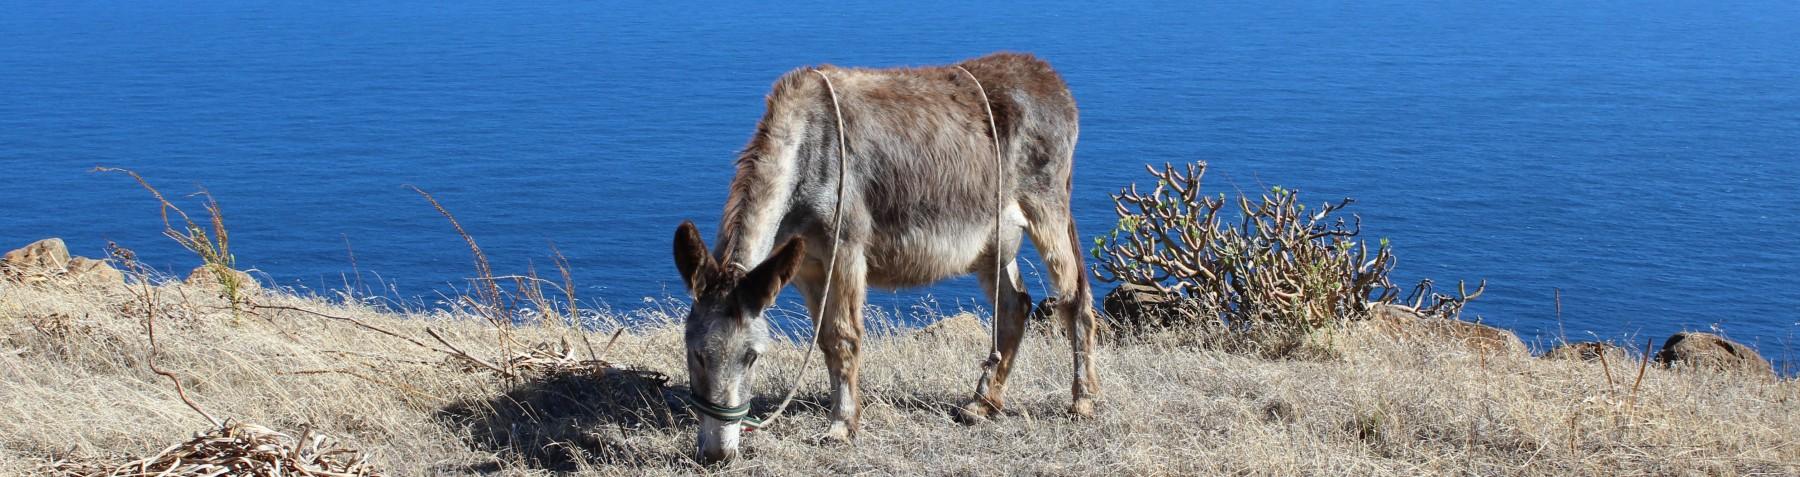 Eselwandern auf La Palma